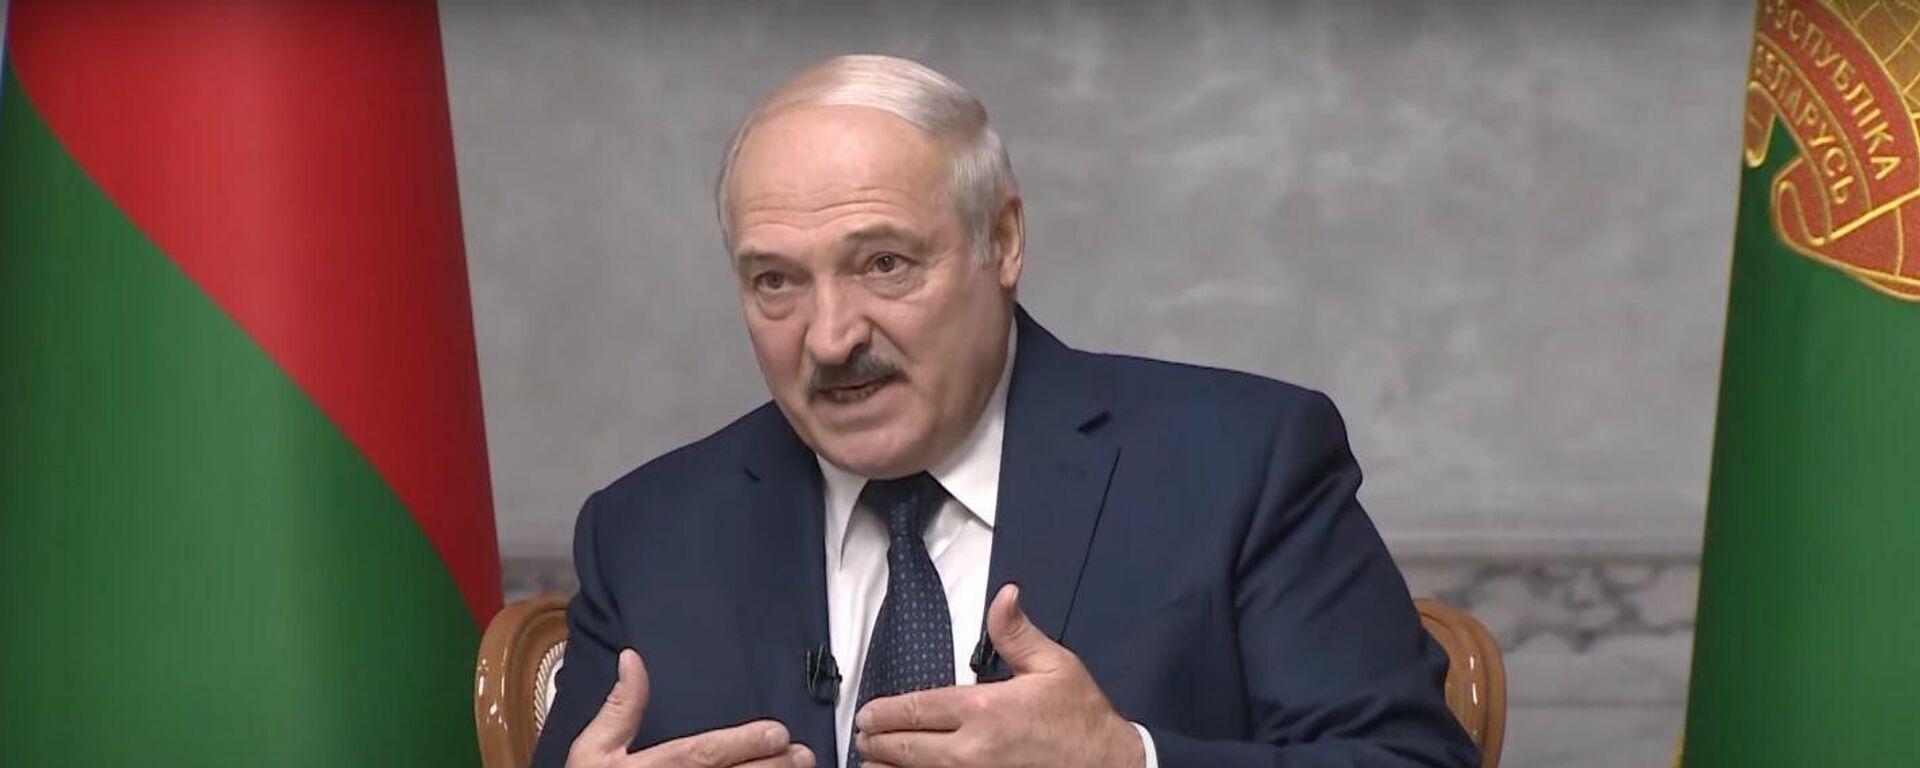 Aleksandr Lukashenko - Sputnik Oʻzbekiston, 1920, 30.07.2021